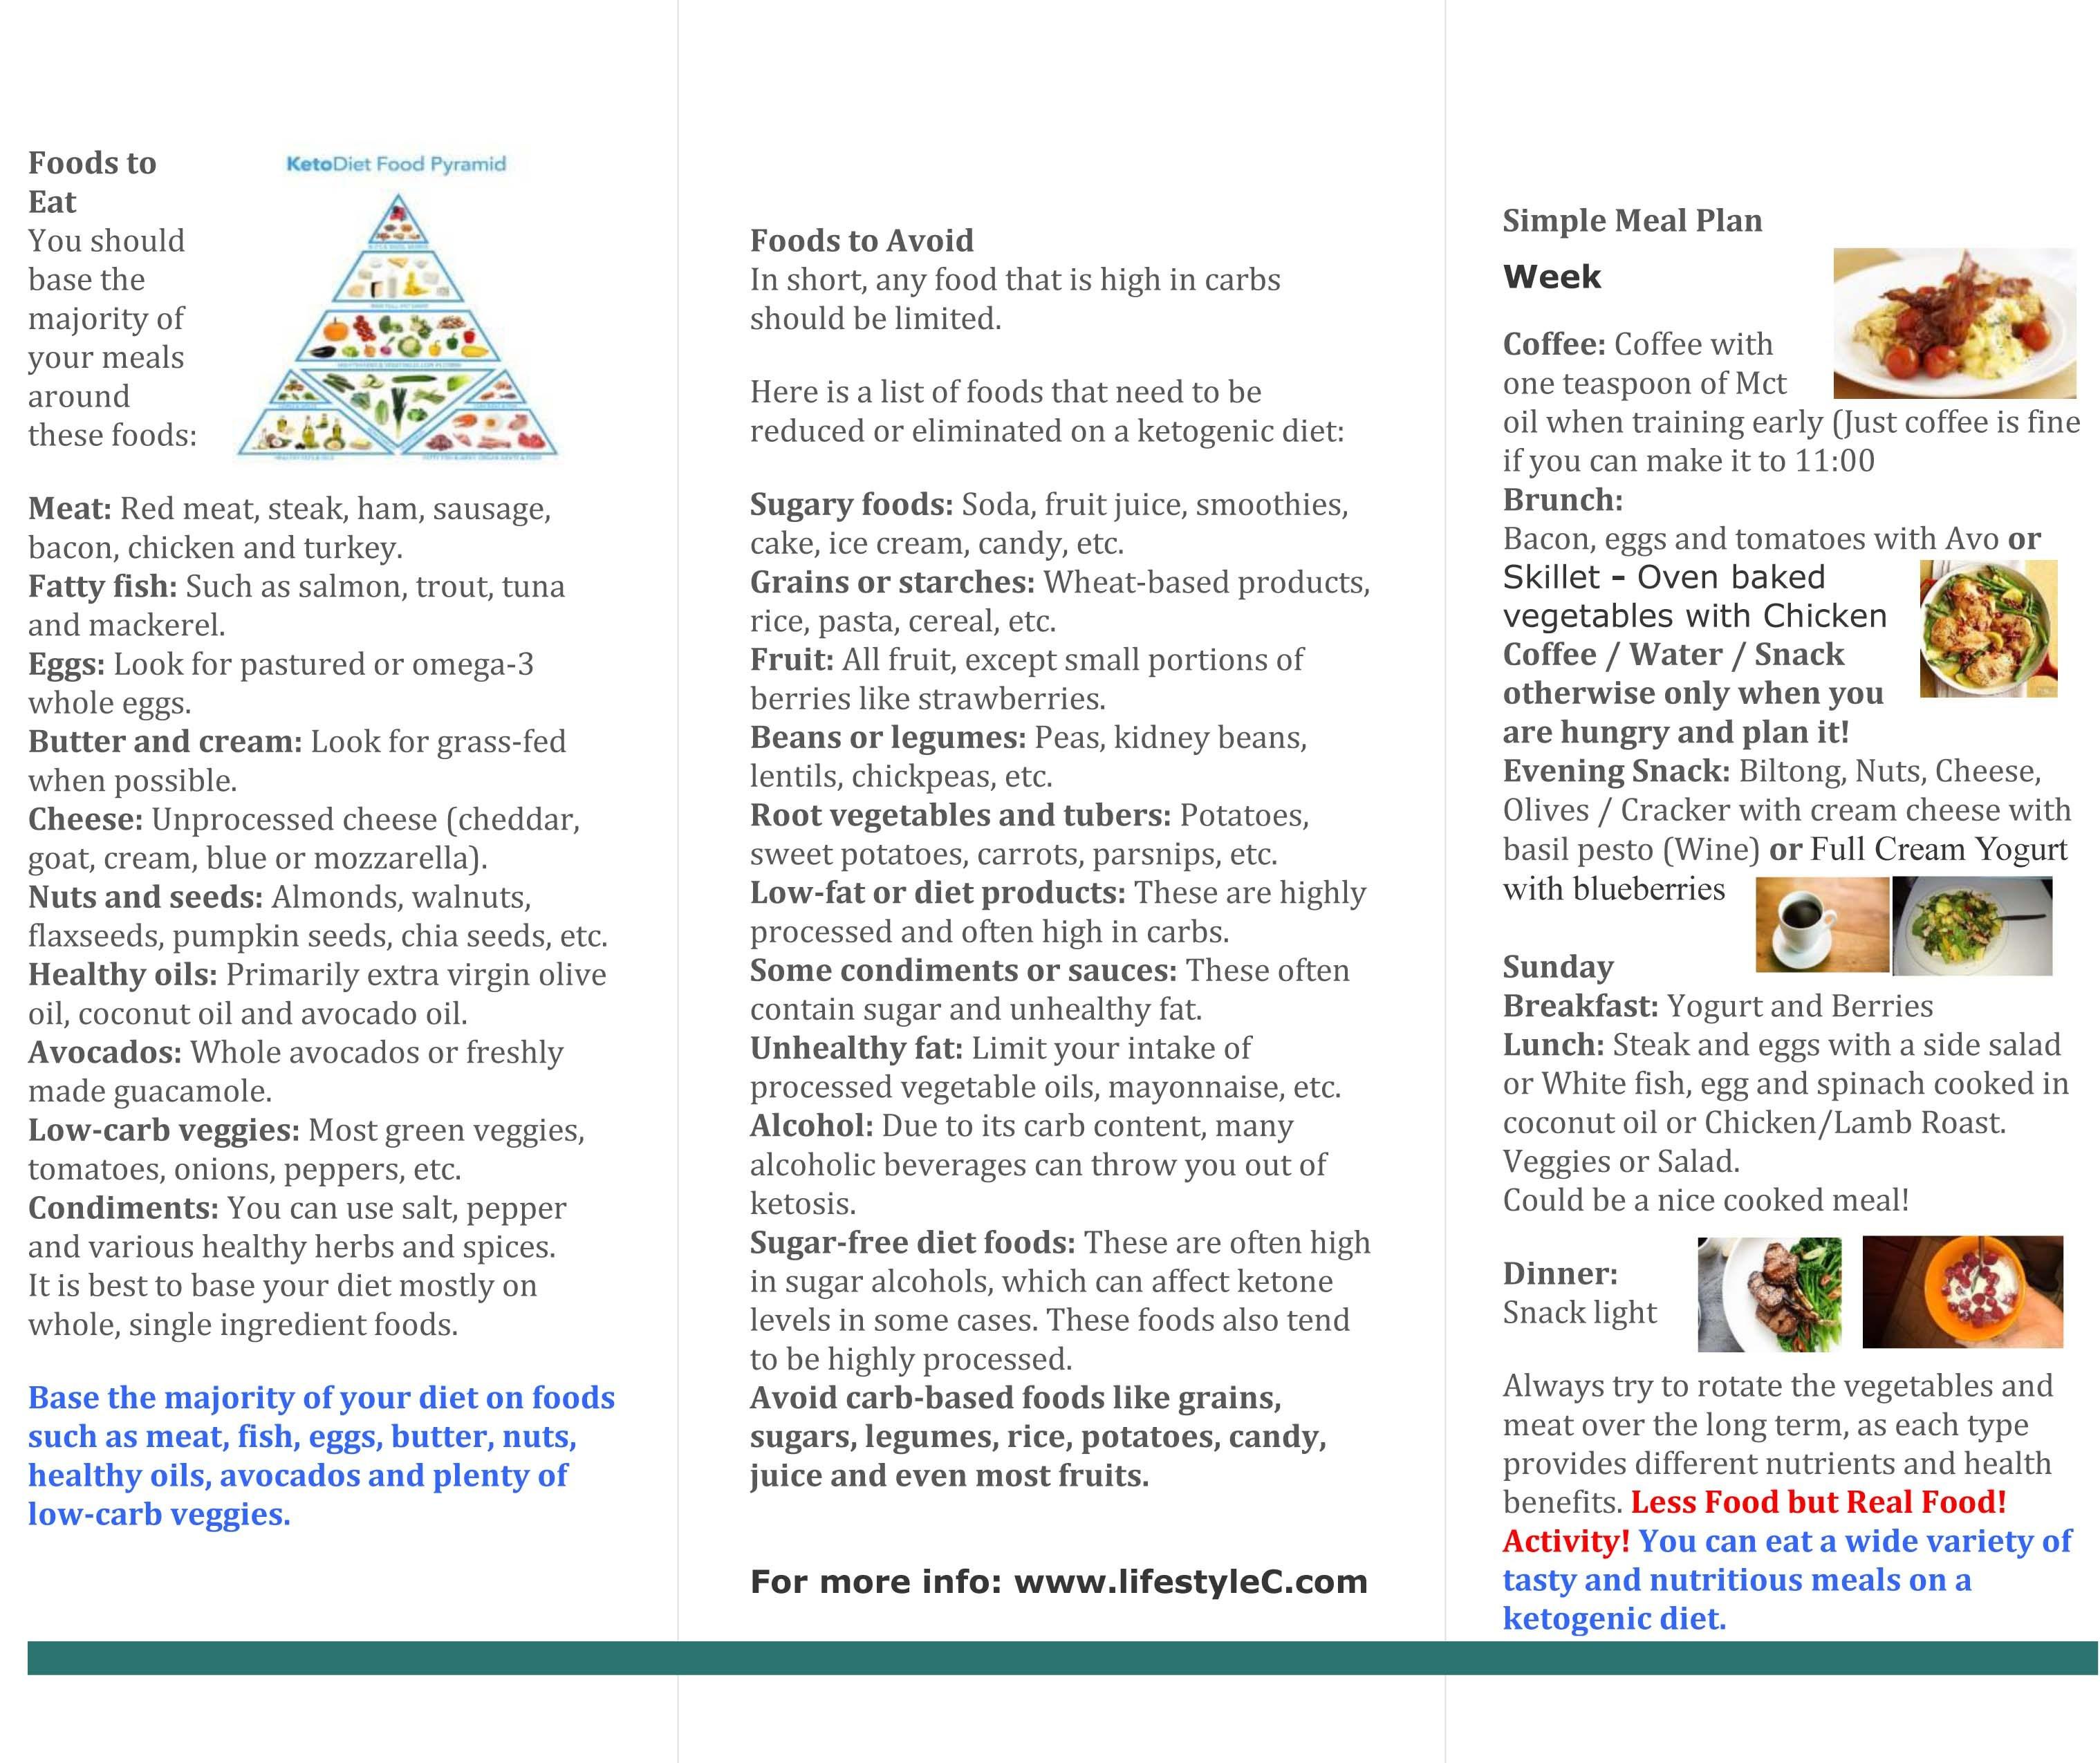 Free Keto Diet Plan  The Ketogenic Lifestyle Basics Weight Loss Short Flyer